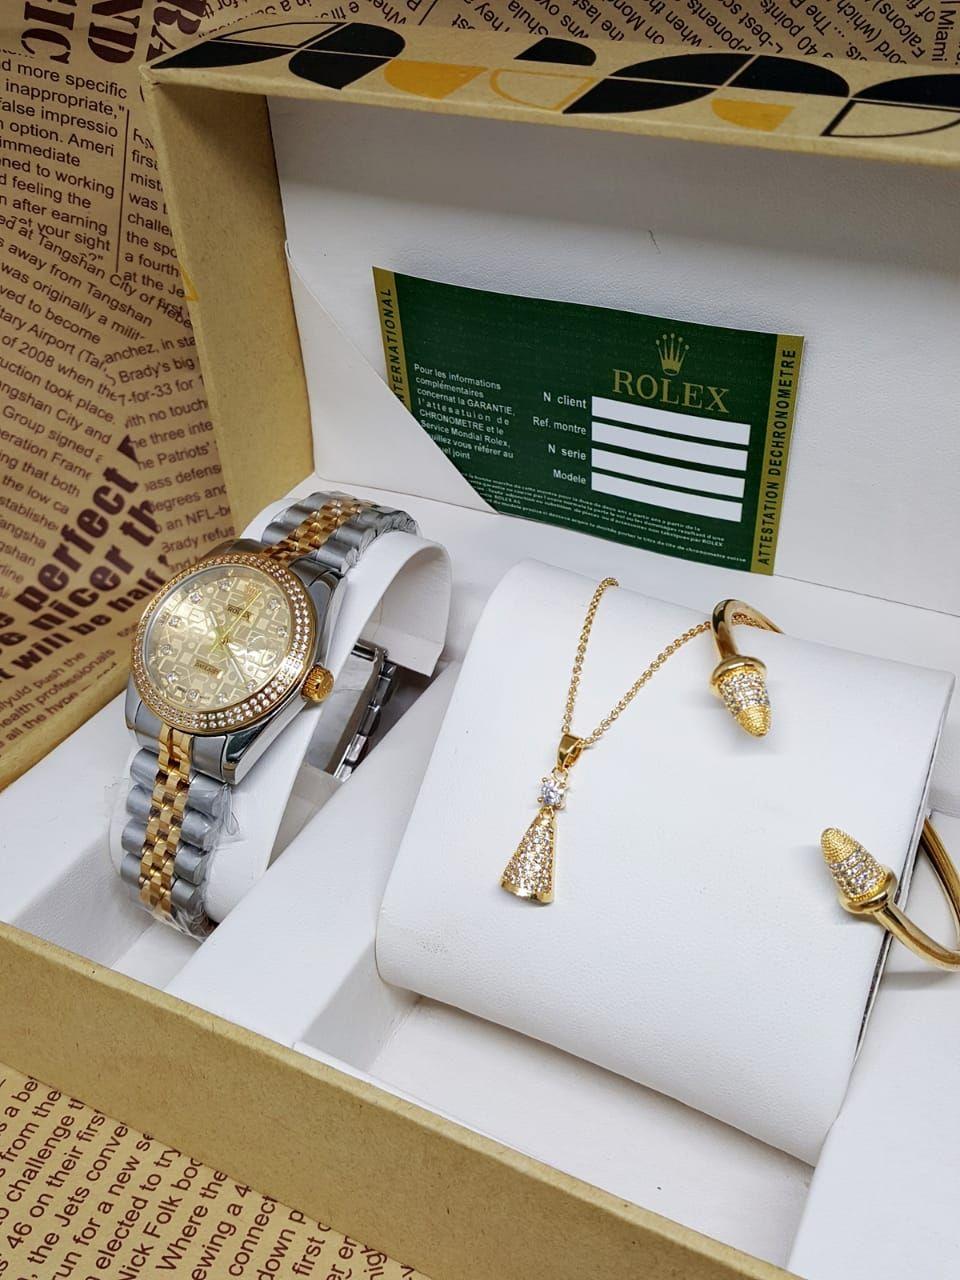 Pin By جوينة العتيبي On ساعات رولكس Bracelet Watch Accessories Rolex